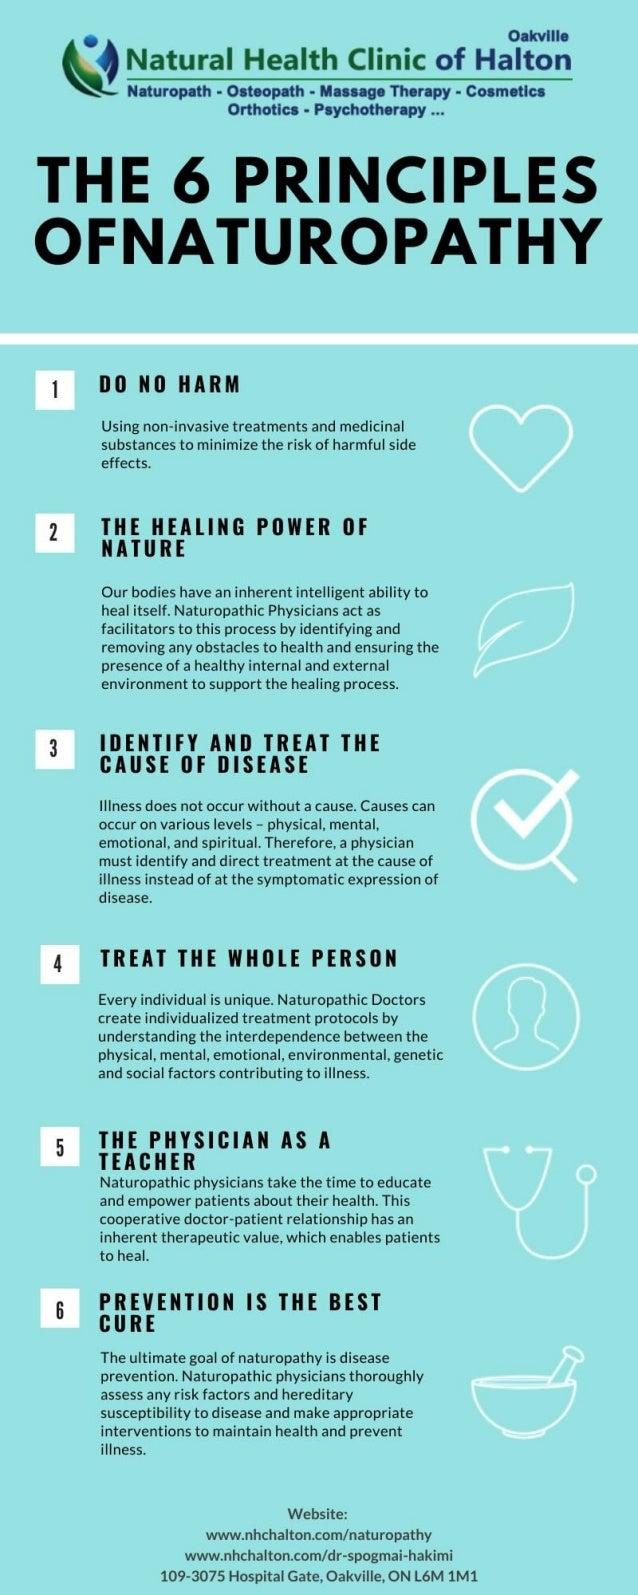 The 6 Principles of Naturopathy